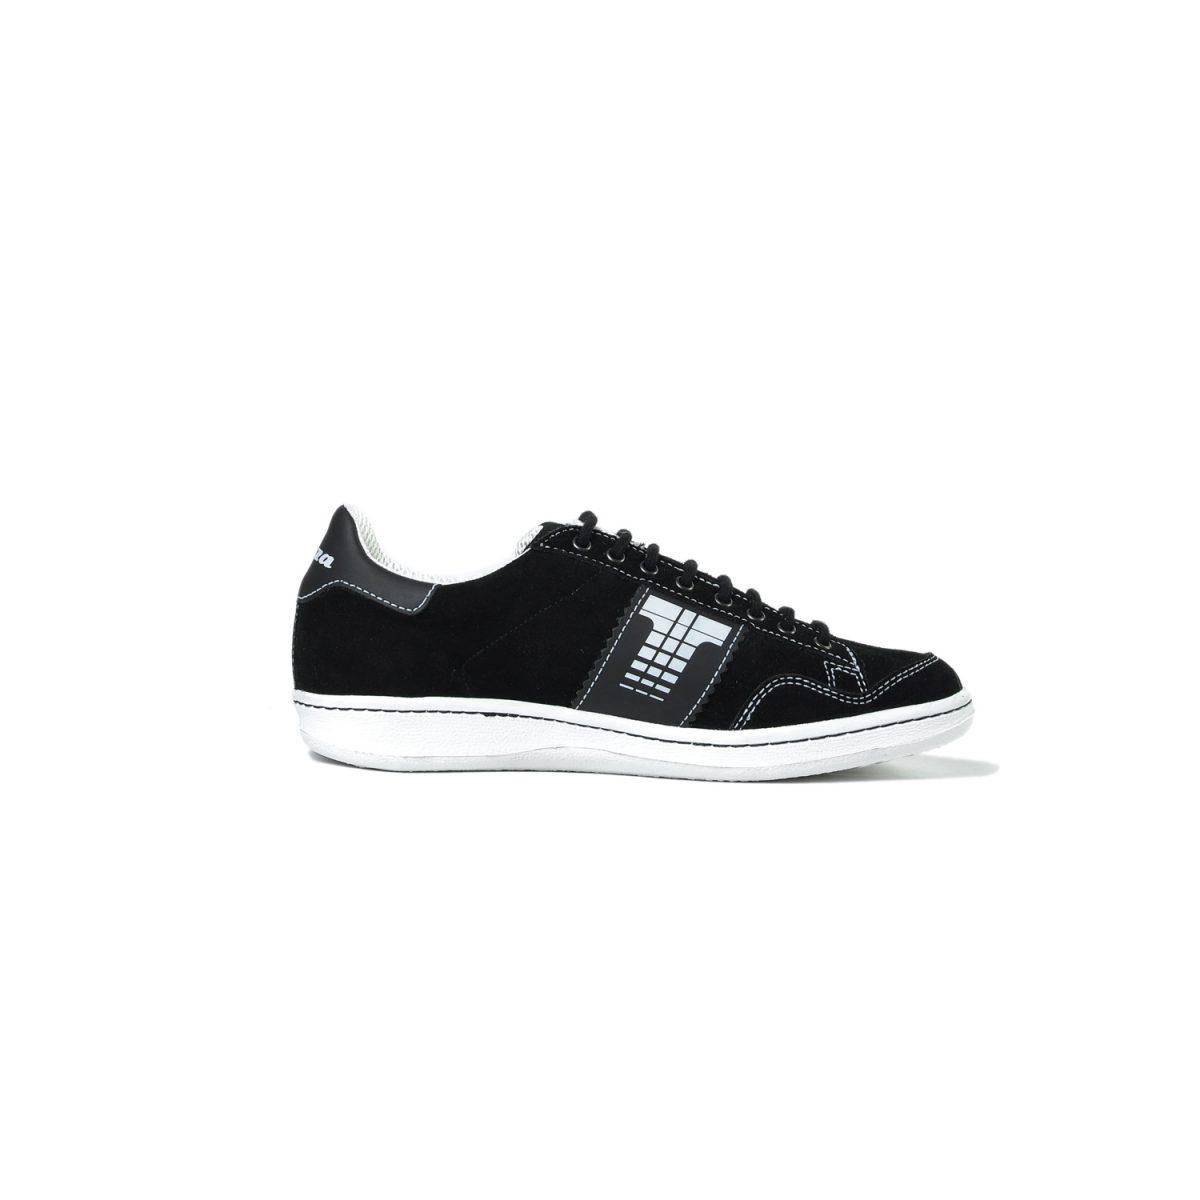 Tisza shoes - Derby - Black-white